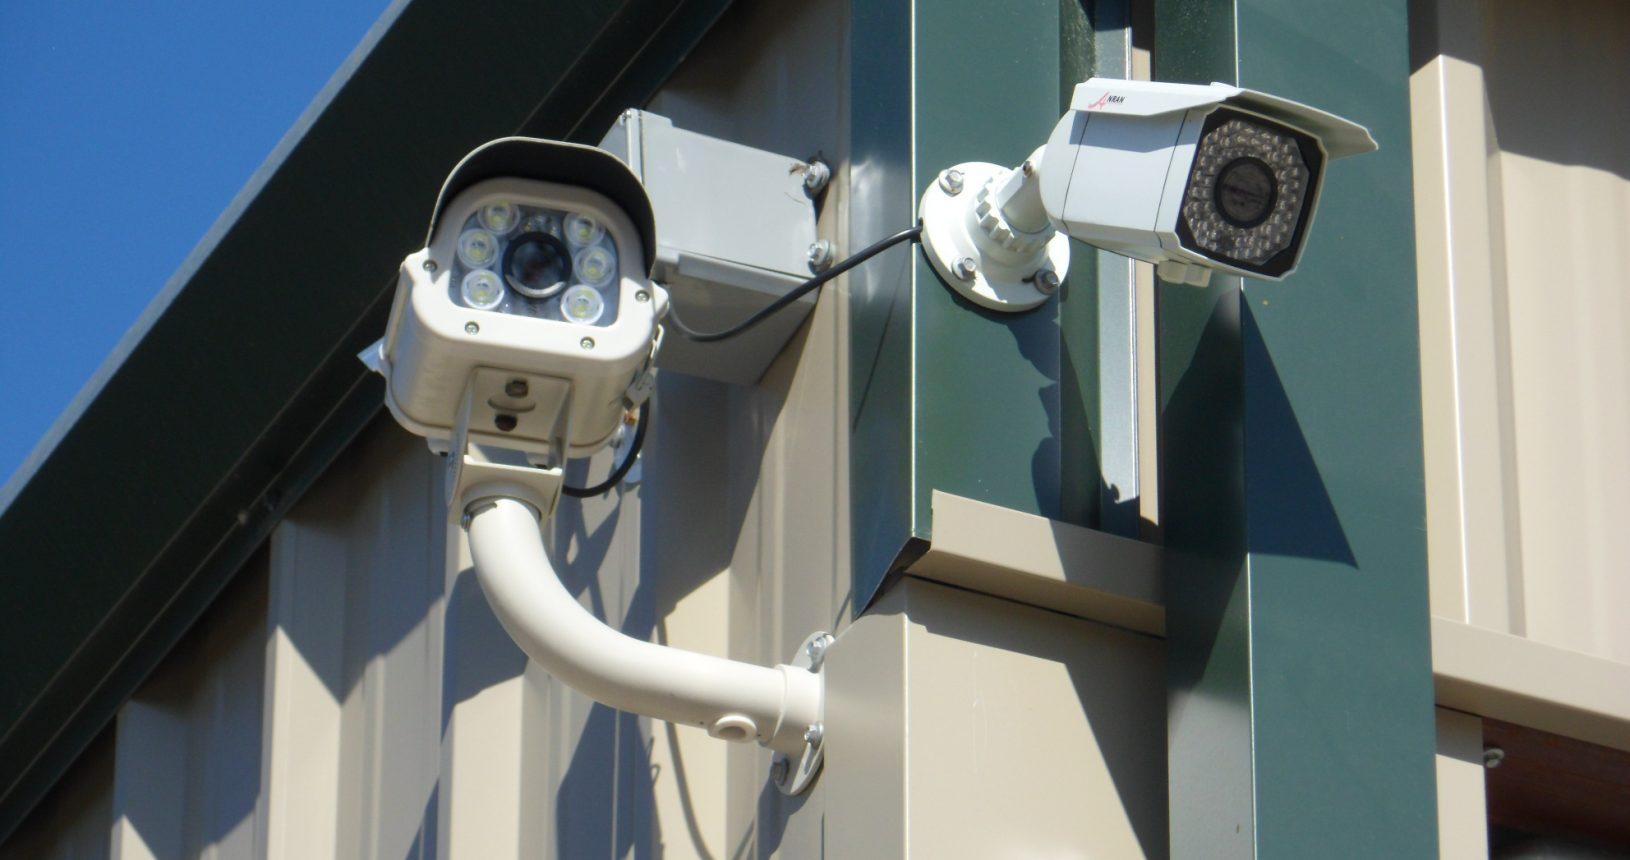 surveillance-cameras-1